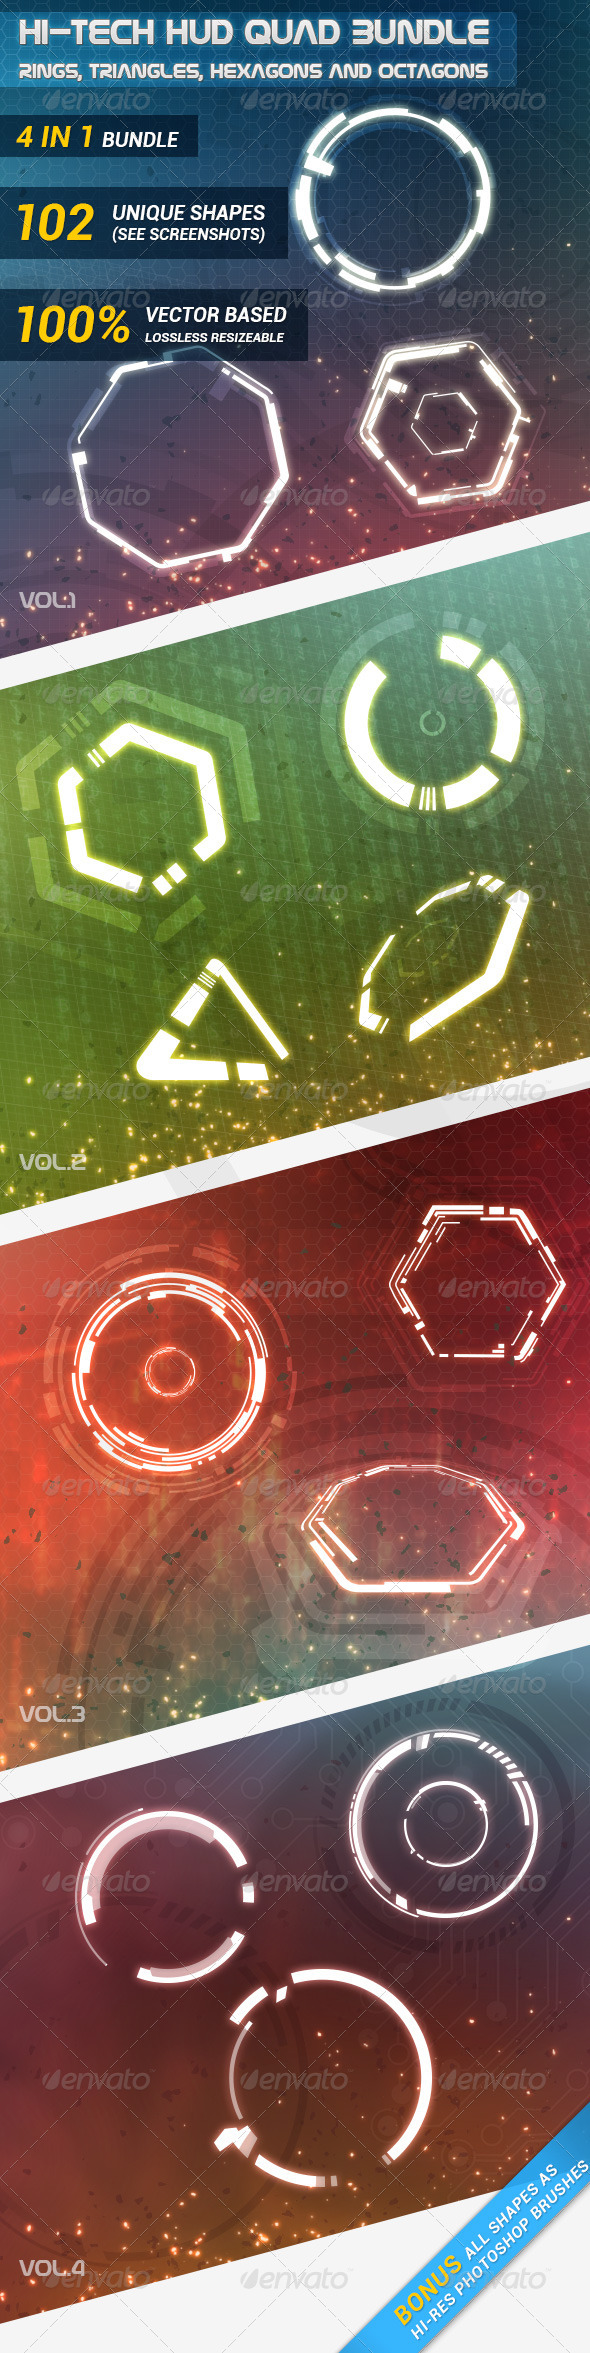 GraphicRiver Hi-Tech HUD Quad Bundle 7568128